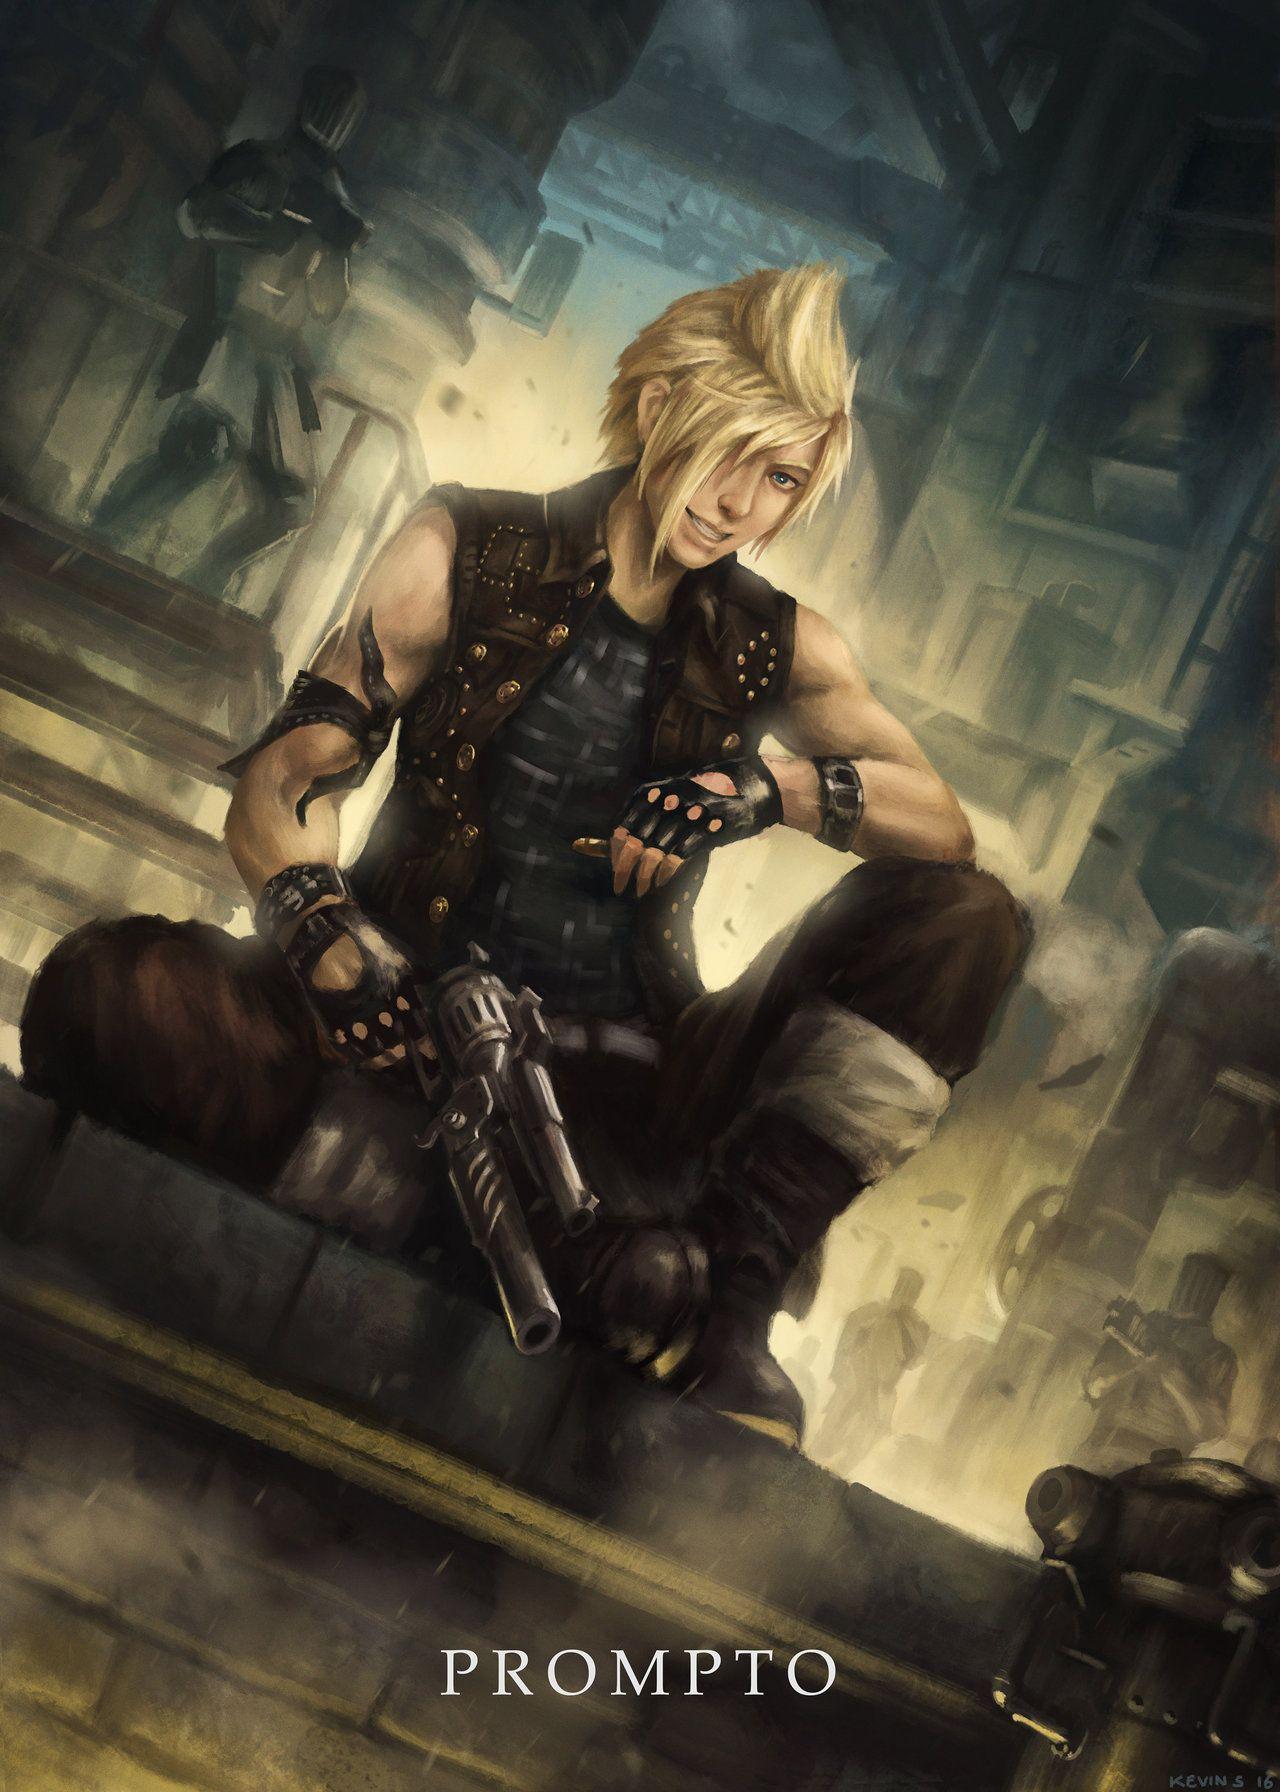 Pin By Grace Katie On Prompto Final Fantasy Xv Prompto Final